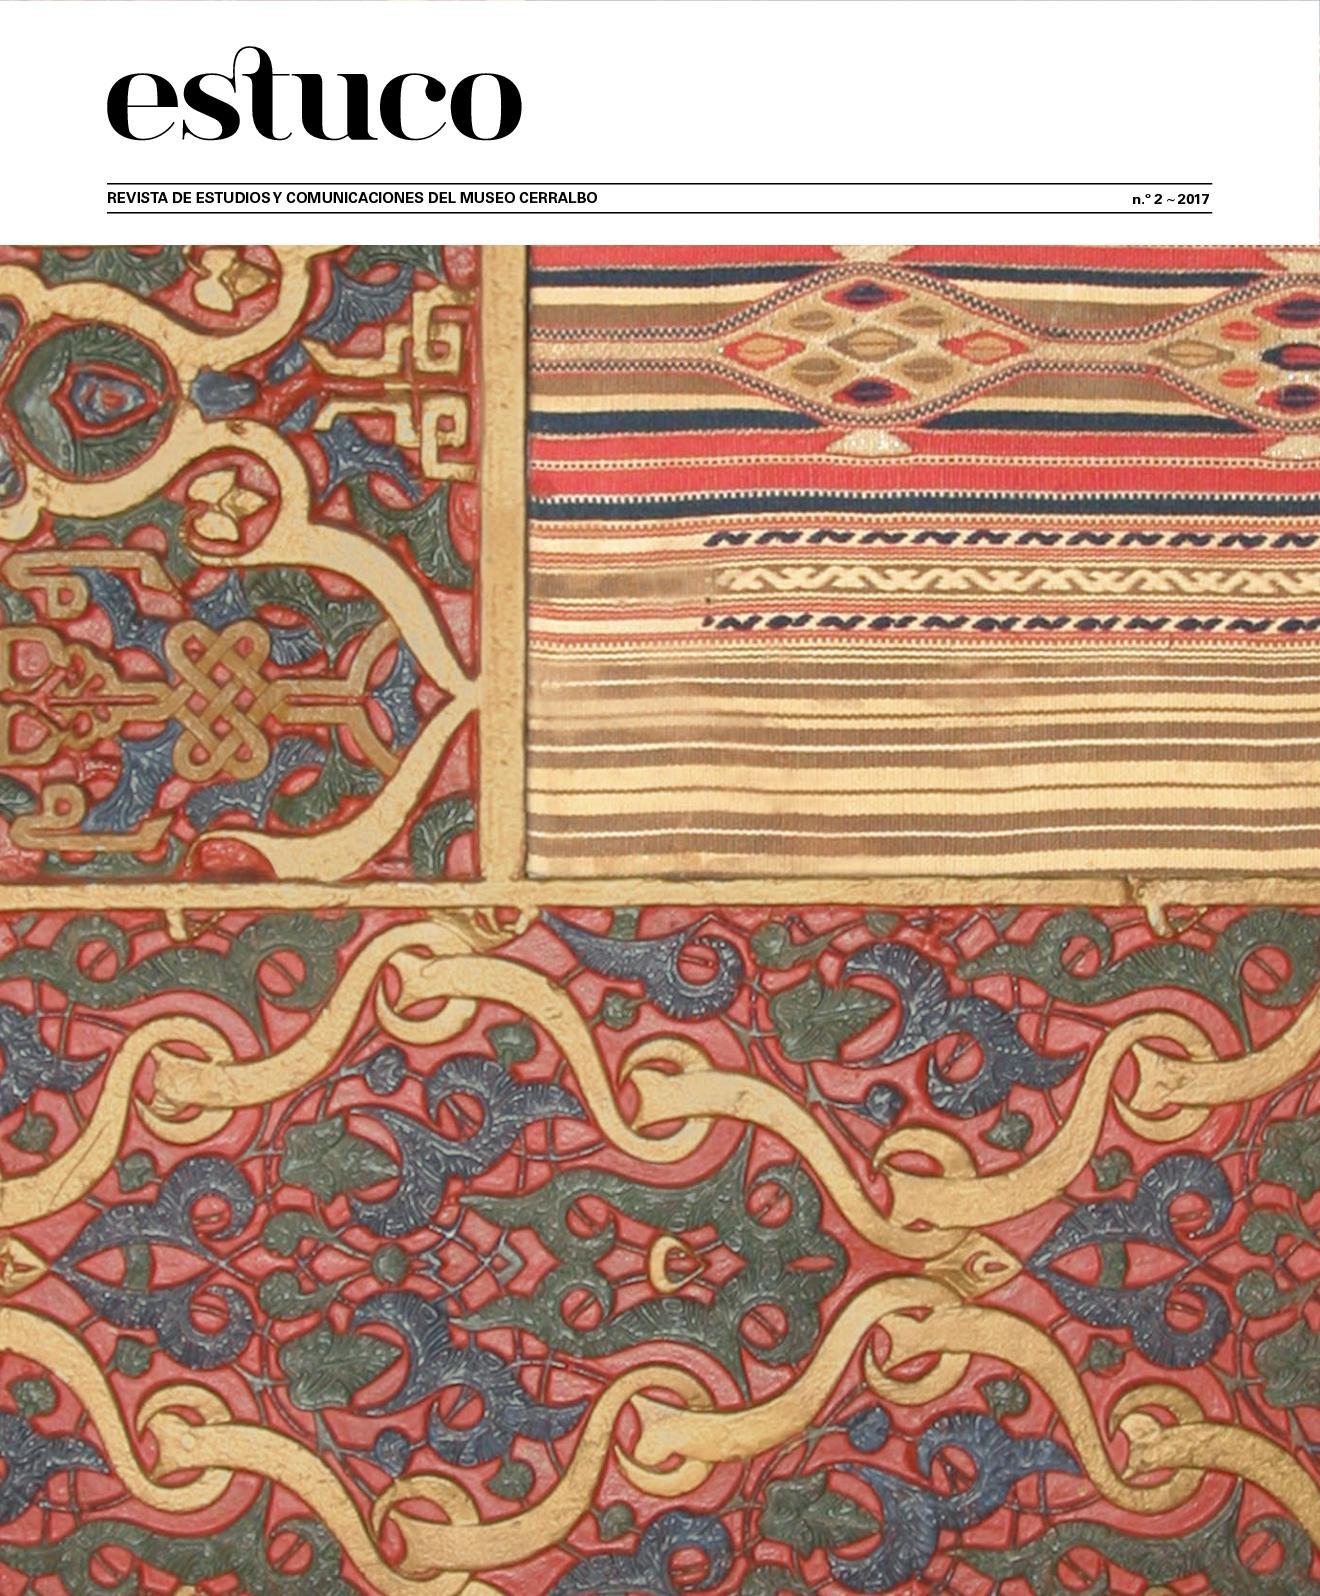 Eloja ® 3 metros corsé cuerda alta calidad de algodón 5 mm ancha rojo